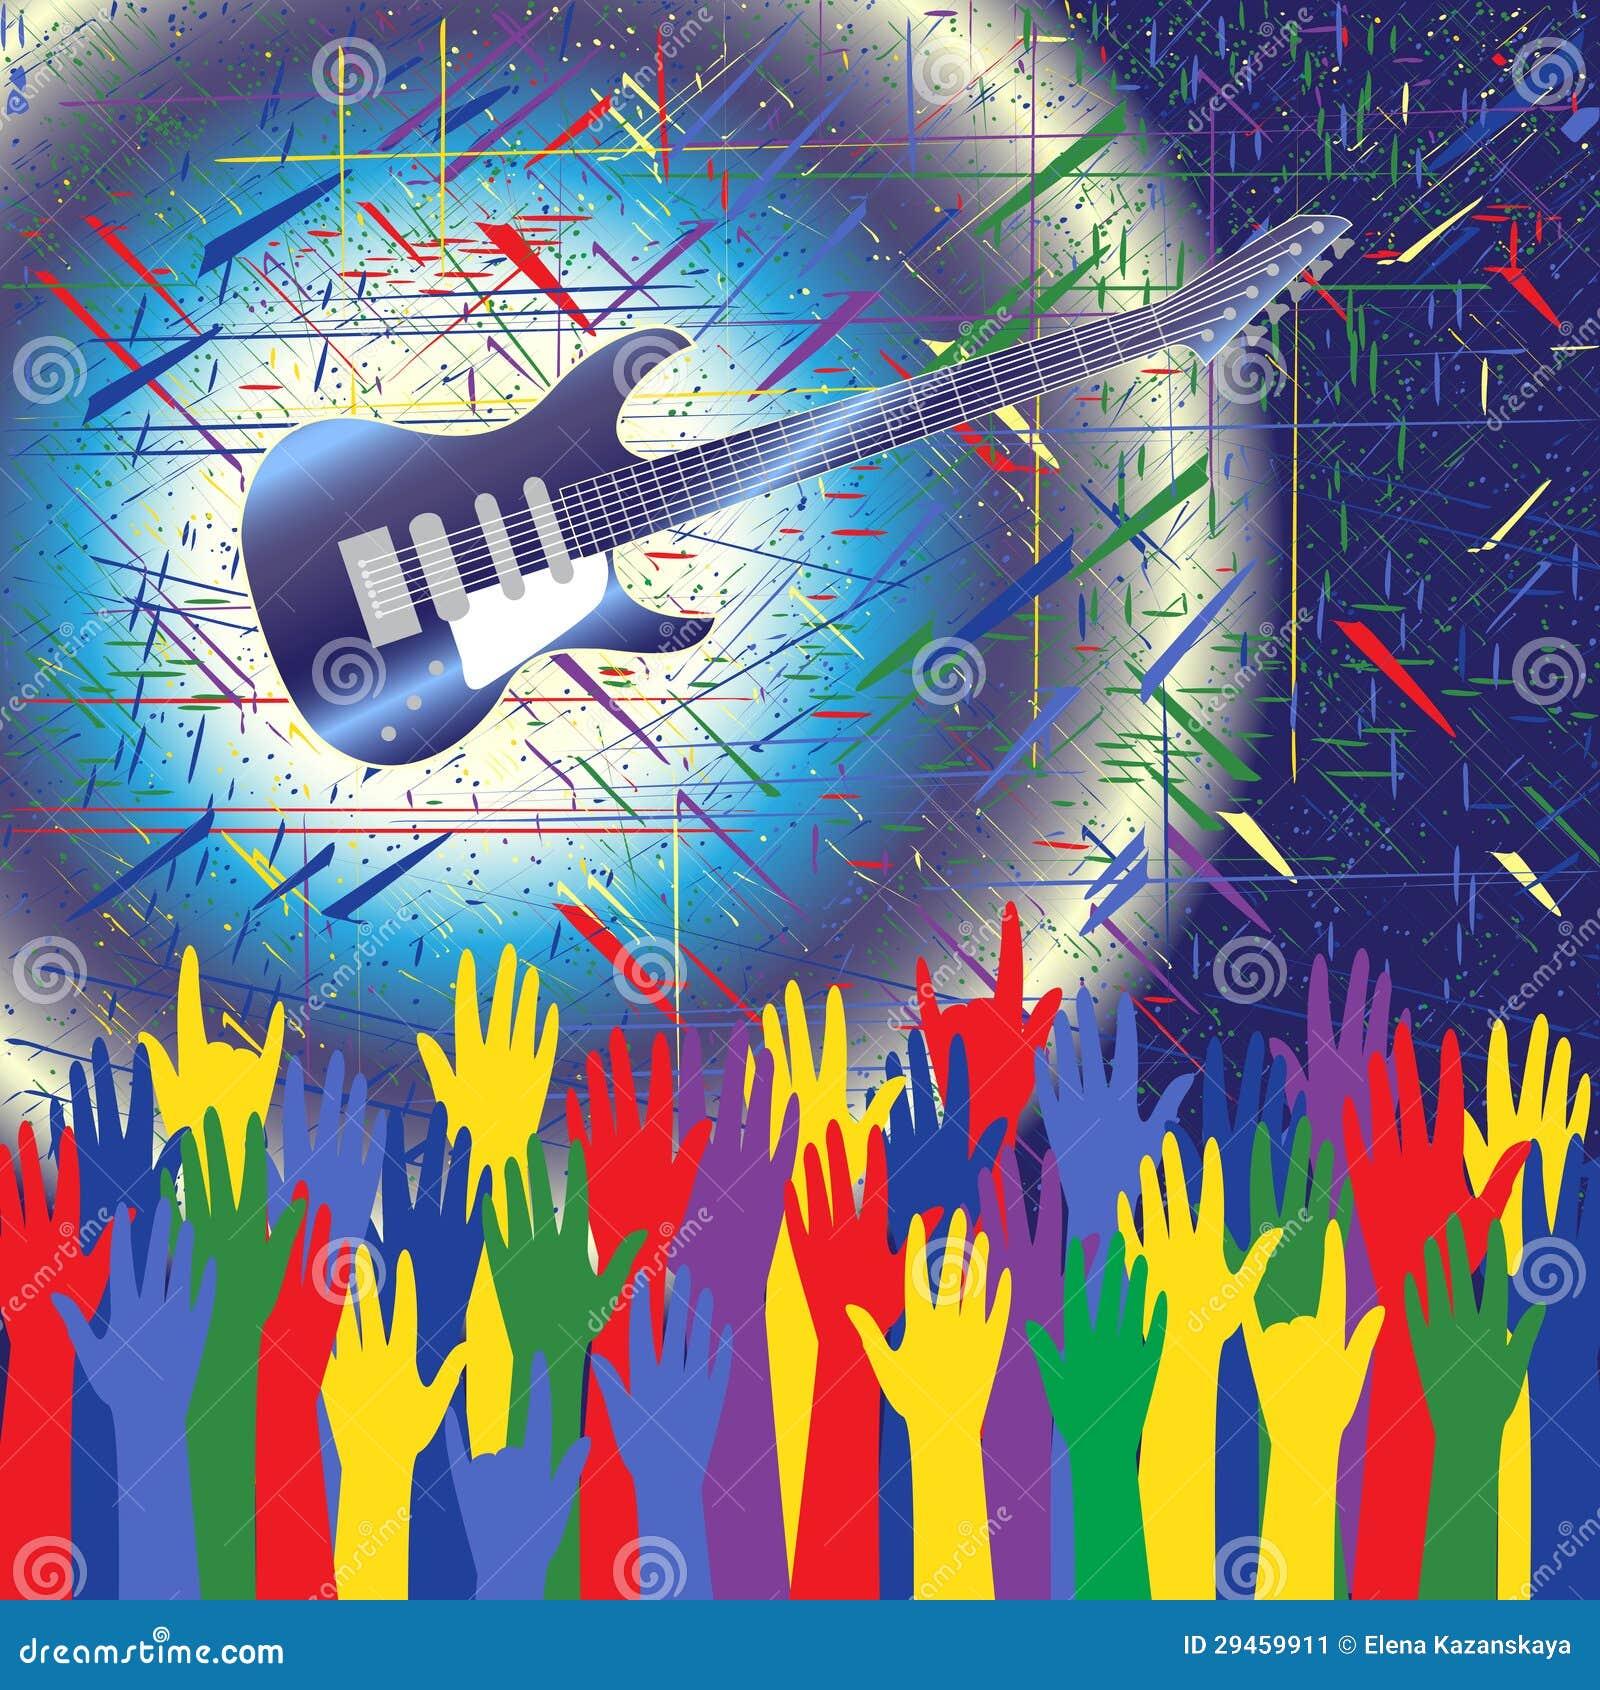 Pics photos rock concert background - Background Concert Guitar Hands Rock